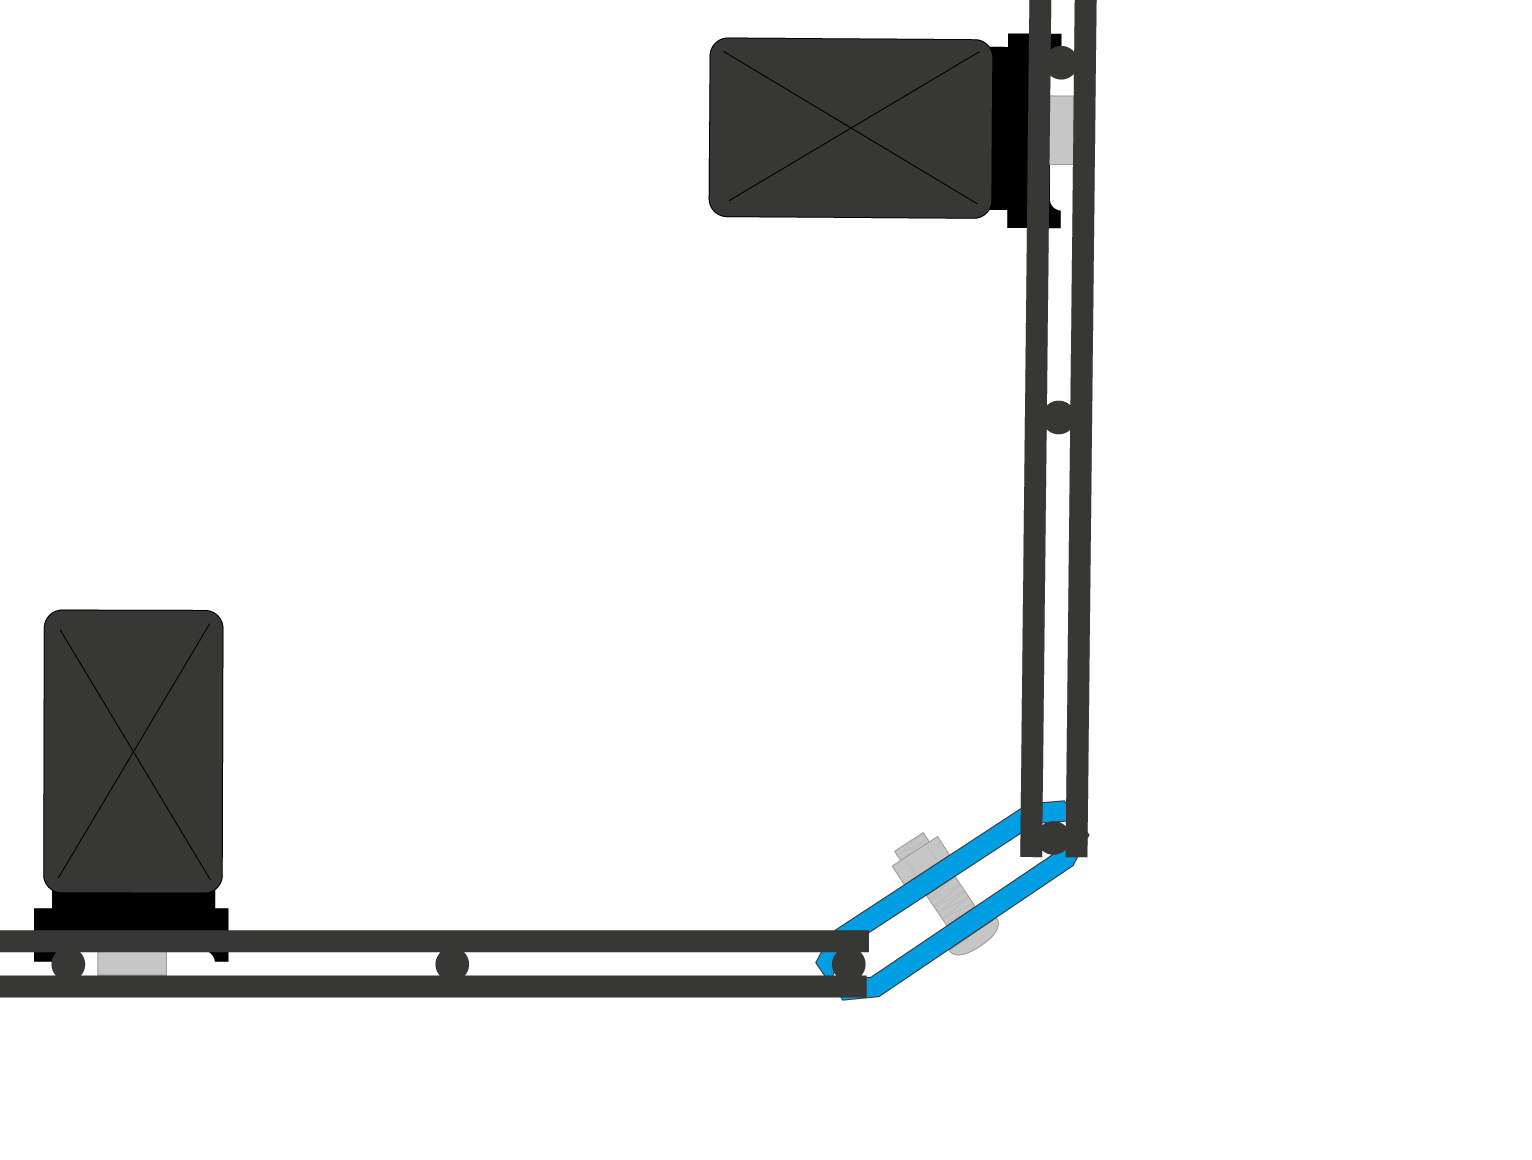 Anbai-Variante Eckverbinder